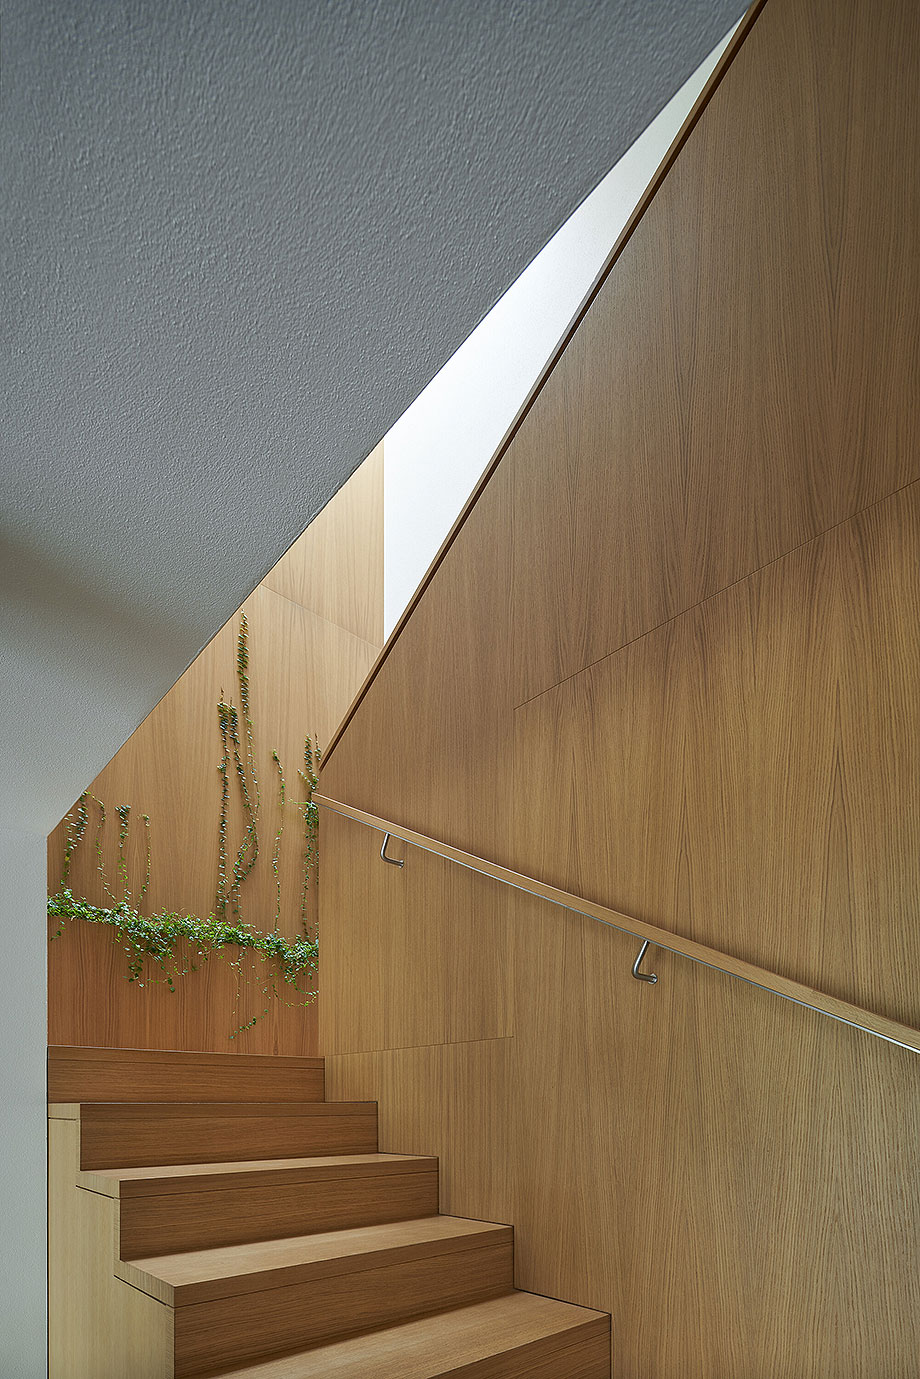 casa lhotka en praga de soa architekti y richter design (9) - foto boysplaynice